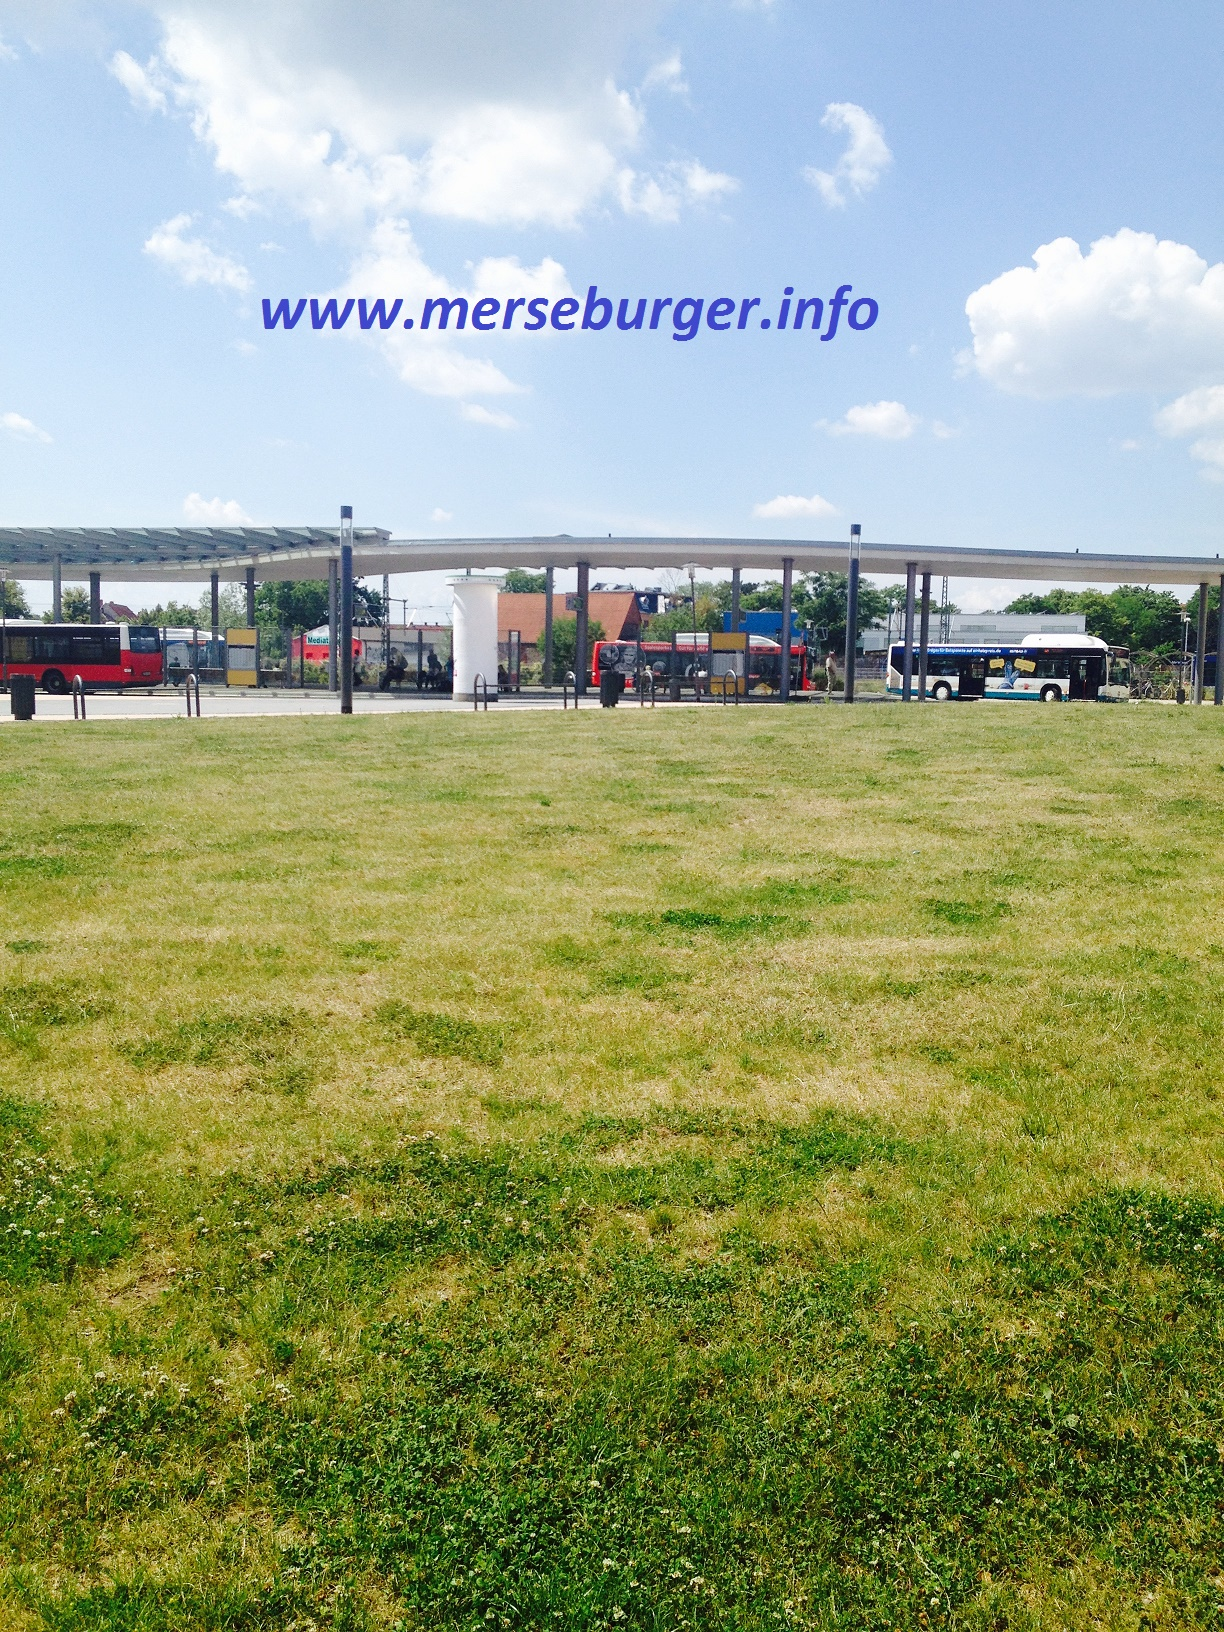 Merseburg Bus-Bahnhof